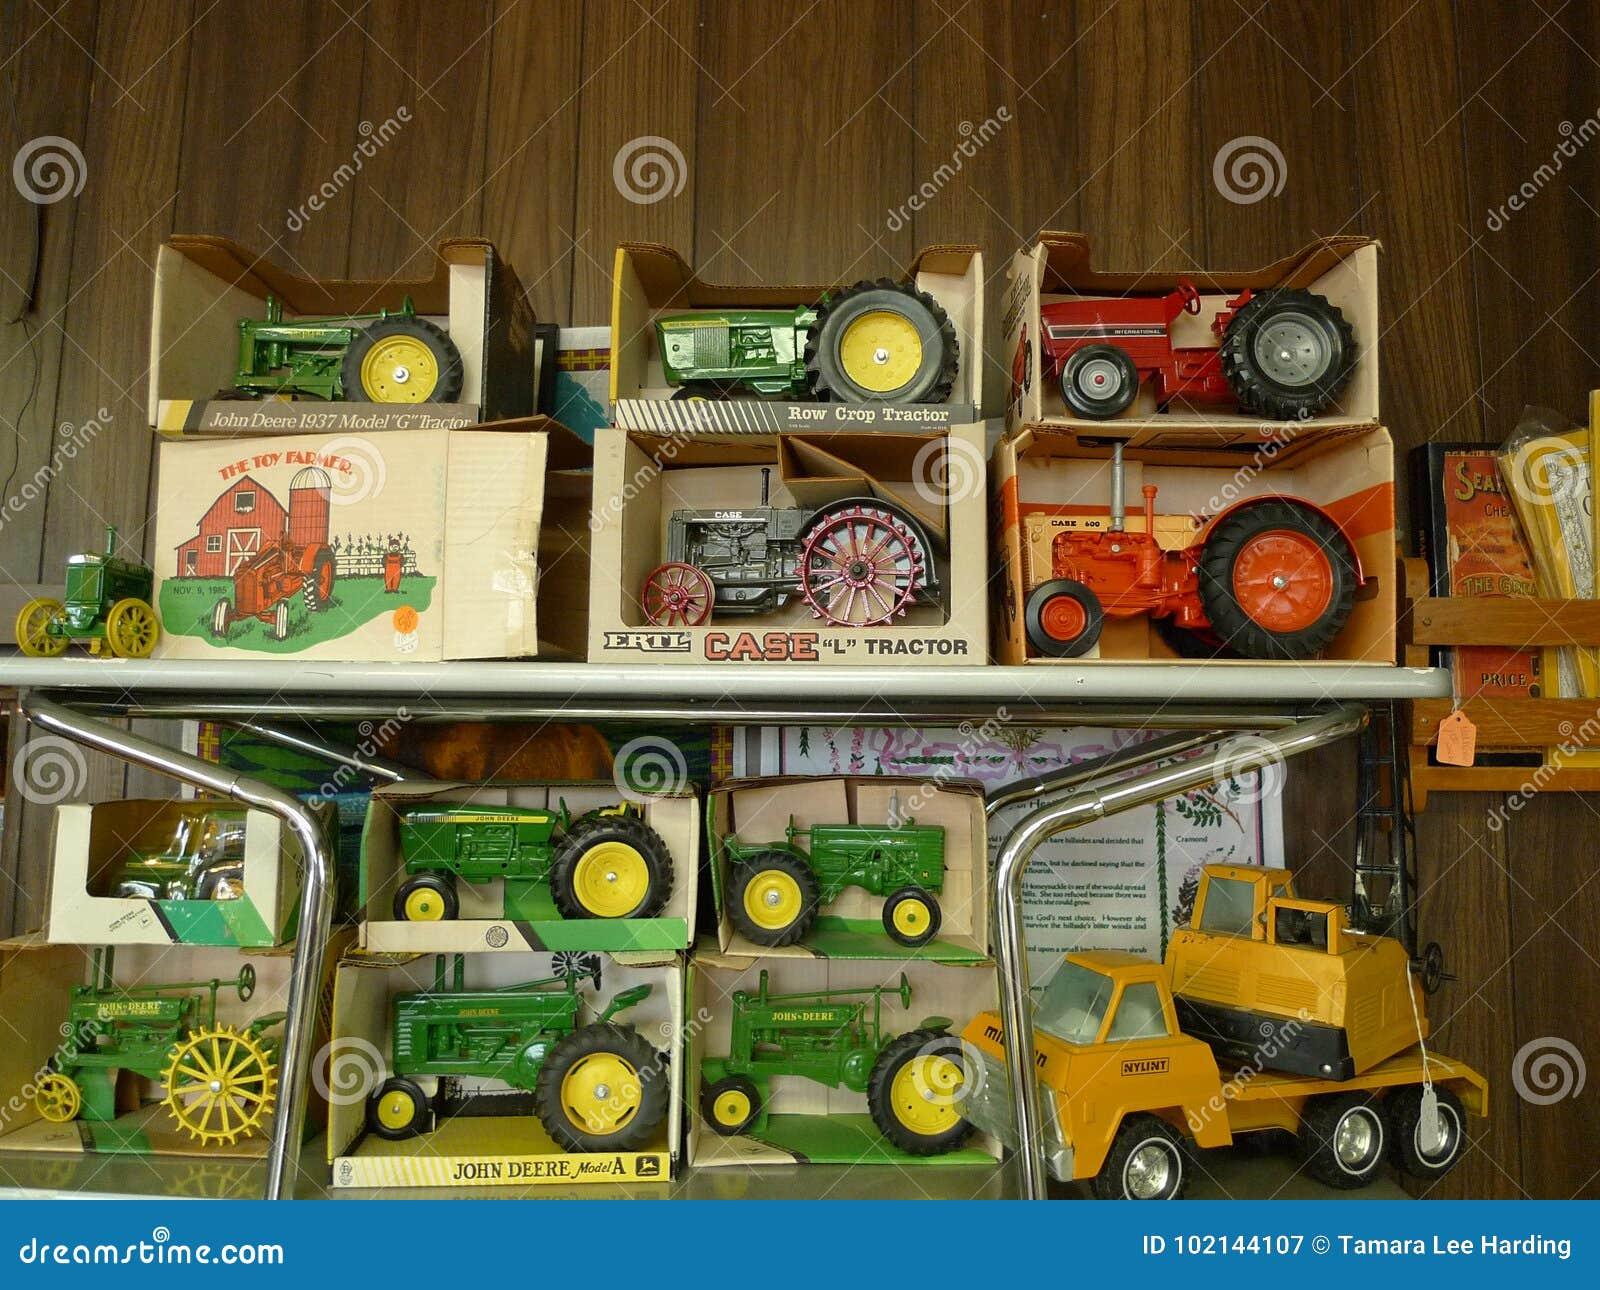 Toys Old Metal Farm Tractors Ertl Case Ih John Deere Editorial Photography Image Of America Junk 102144107